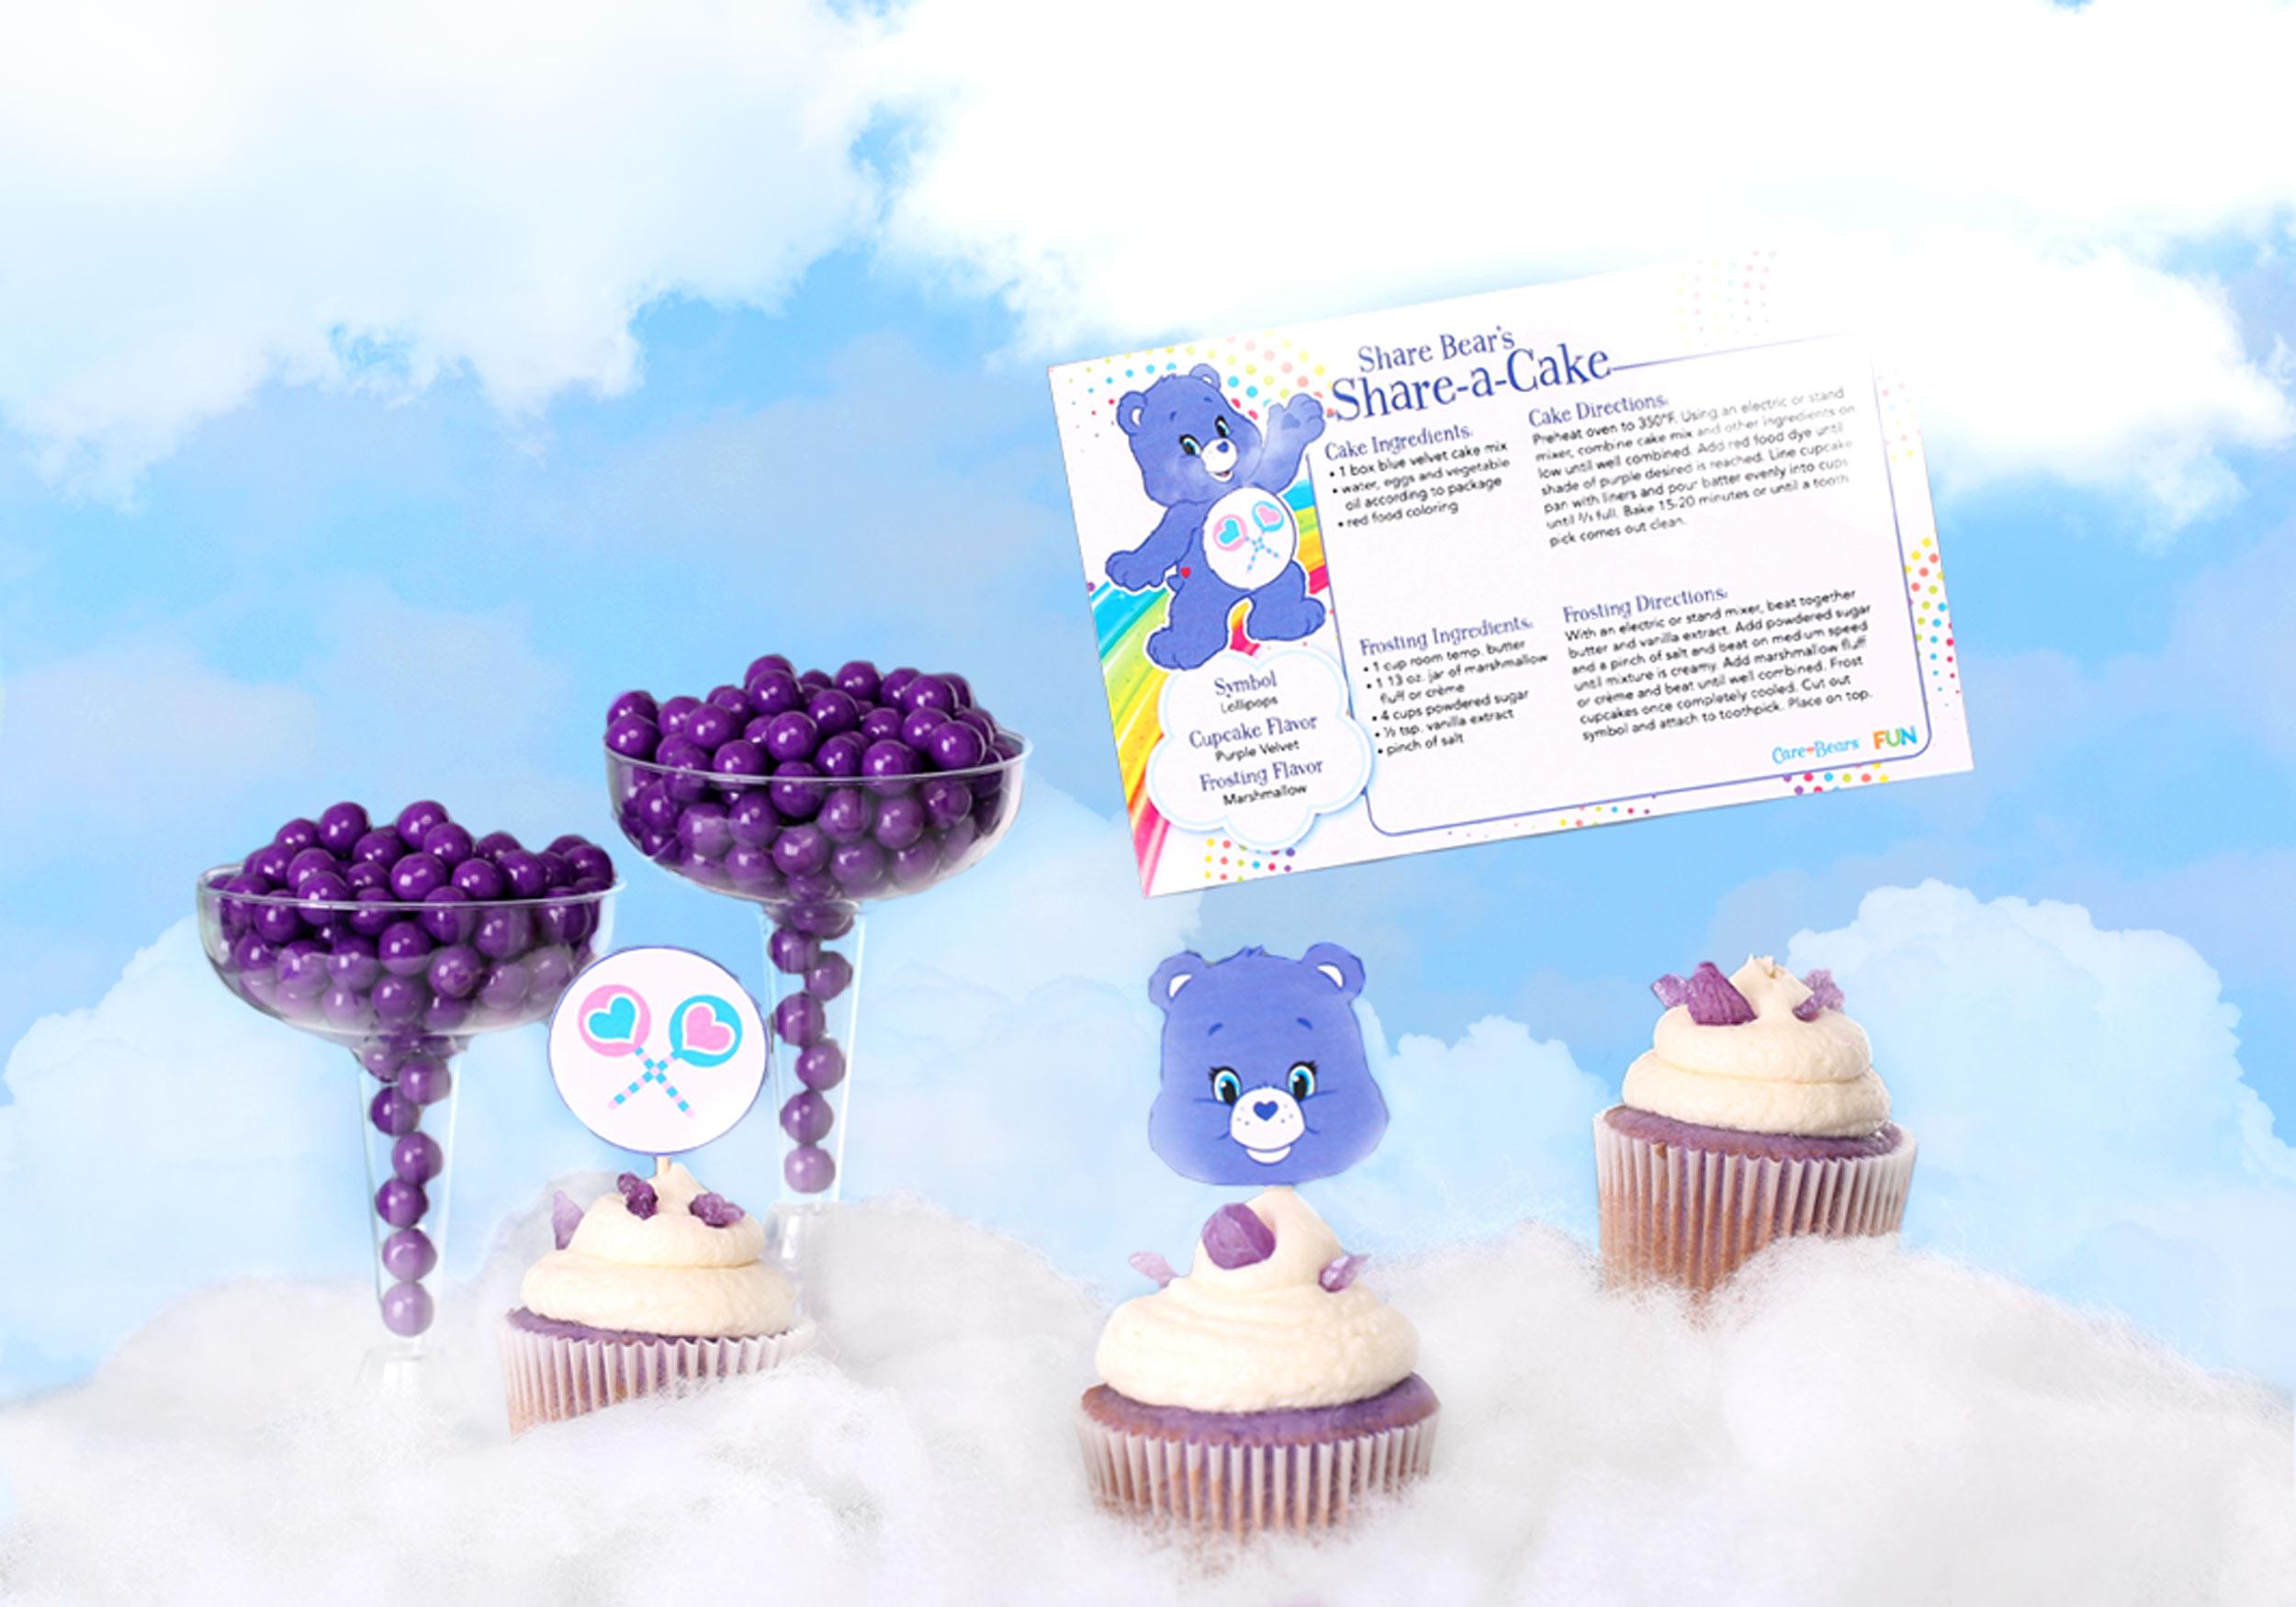 Share Bear cupcakes